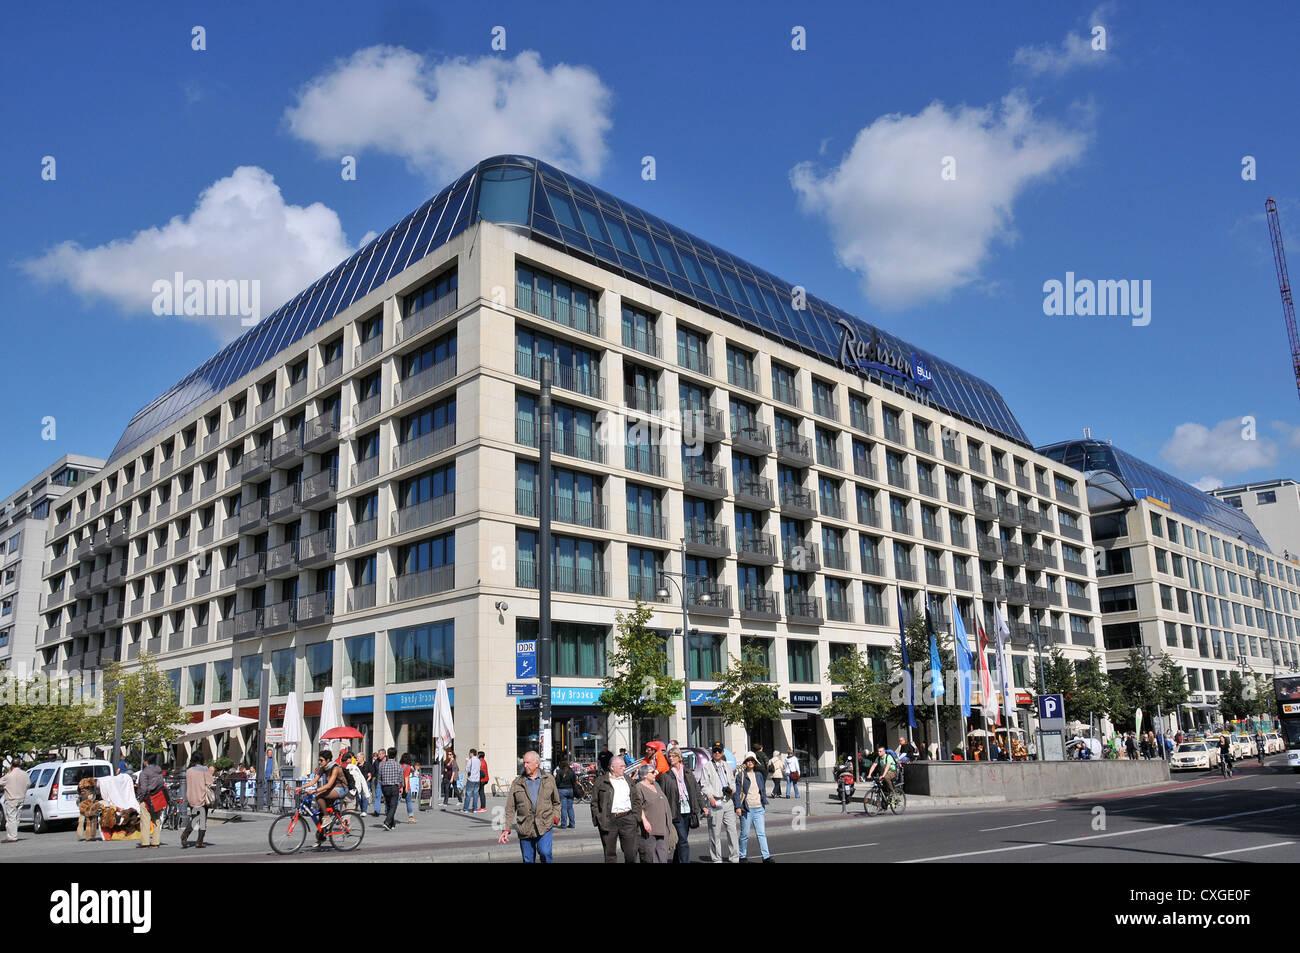 radisson blu hotel berlin germany stock photo royalty free image 50764015 alamy. Black Bedroom Furniture Sets. Home Design Ideas